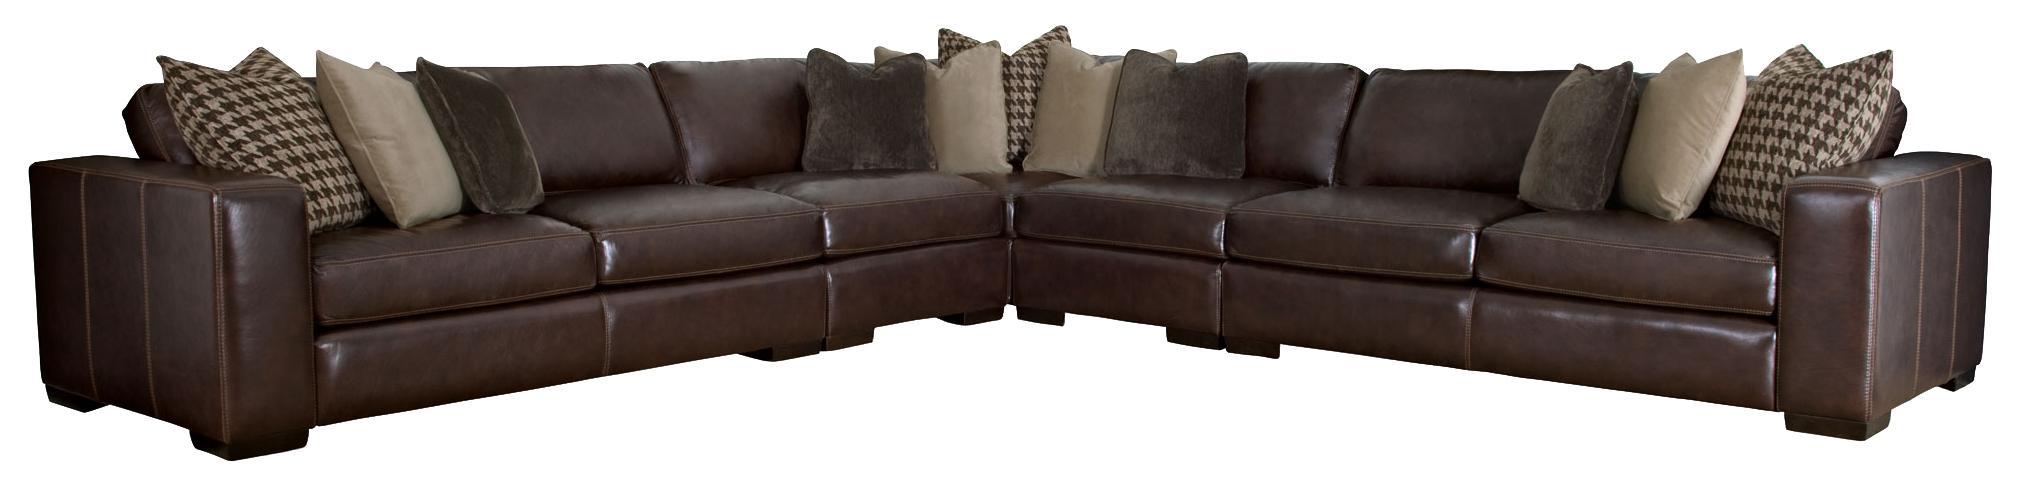 Bernhardt Dorian By Bernhardt Sectional Sofa   Item Number: 6942L+30L+32L+